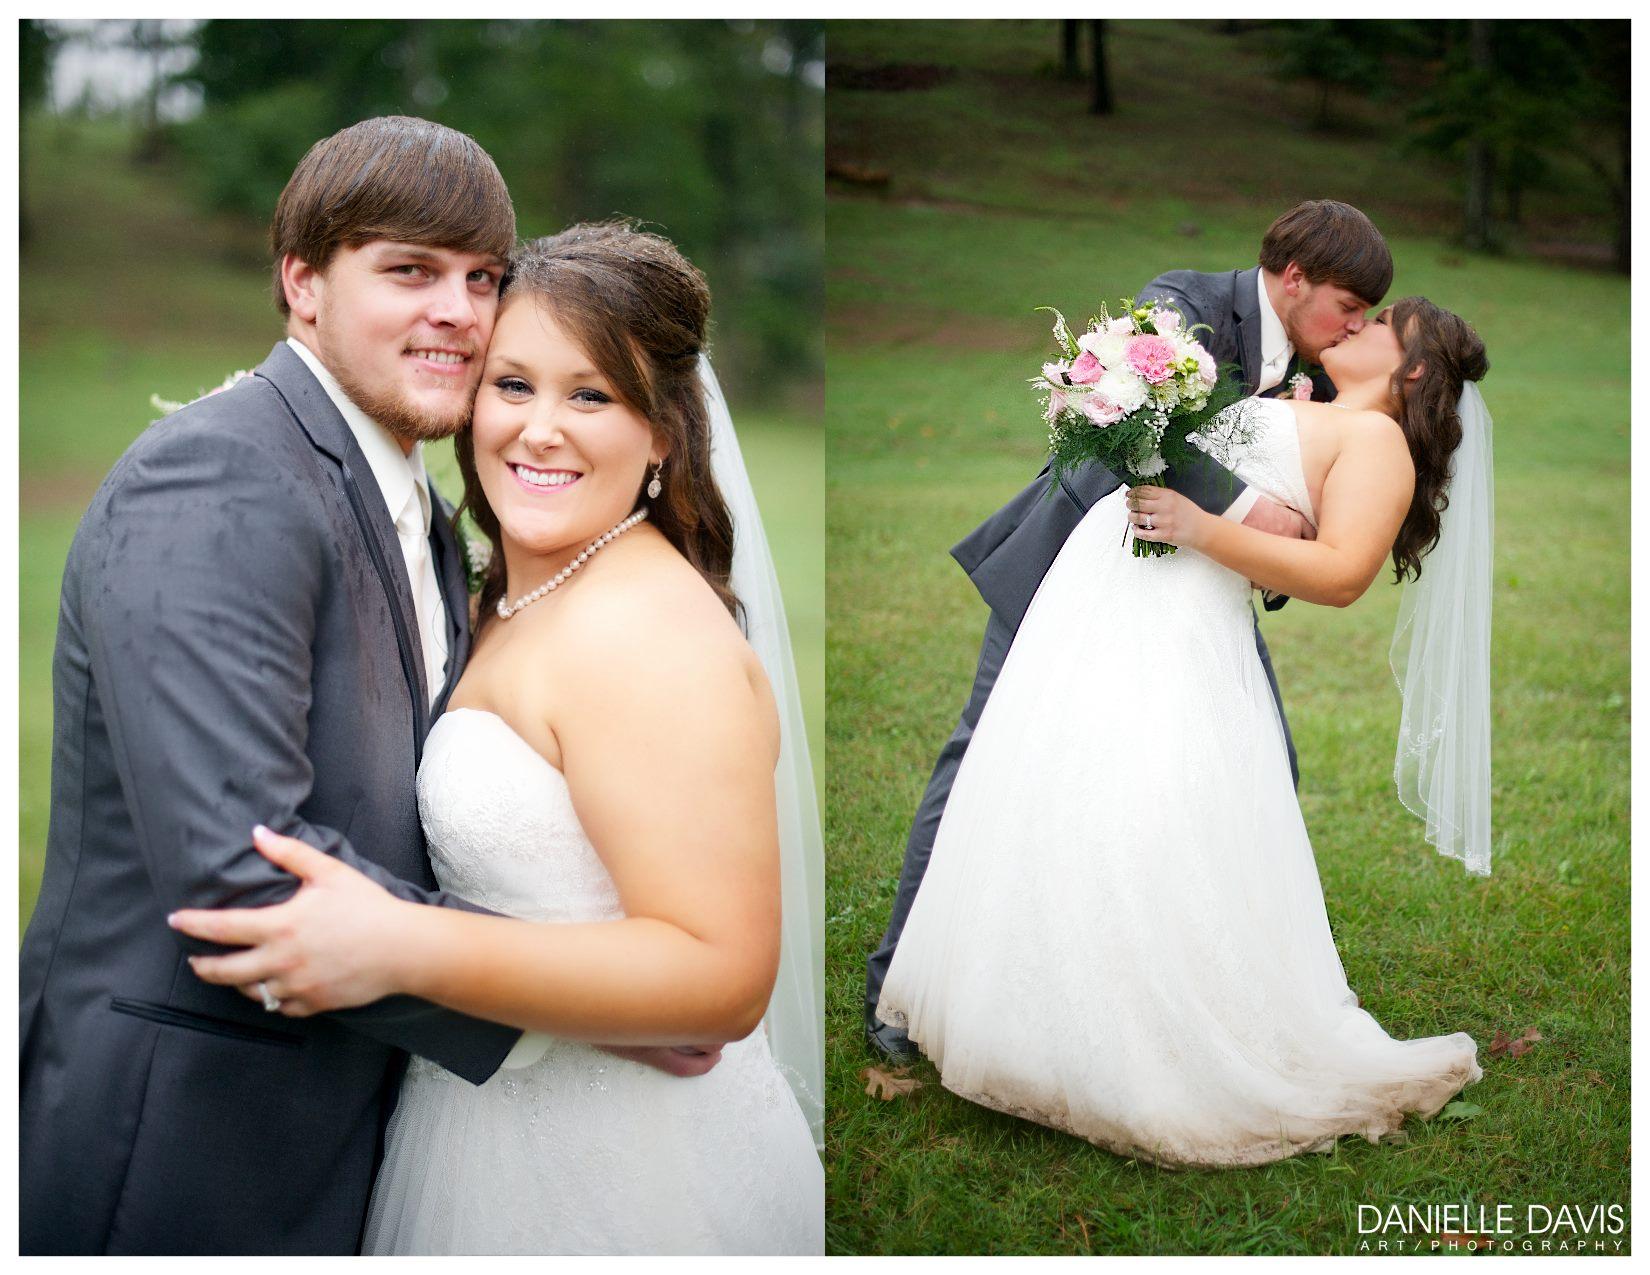 Danielle Davis Art/Photography , from  Ashton + Mickey 's wedding at The Barn